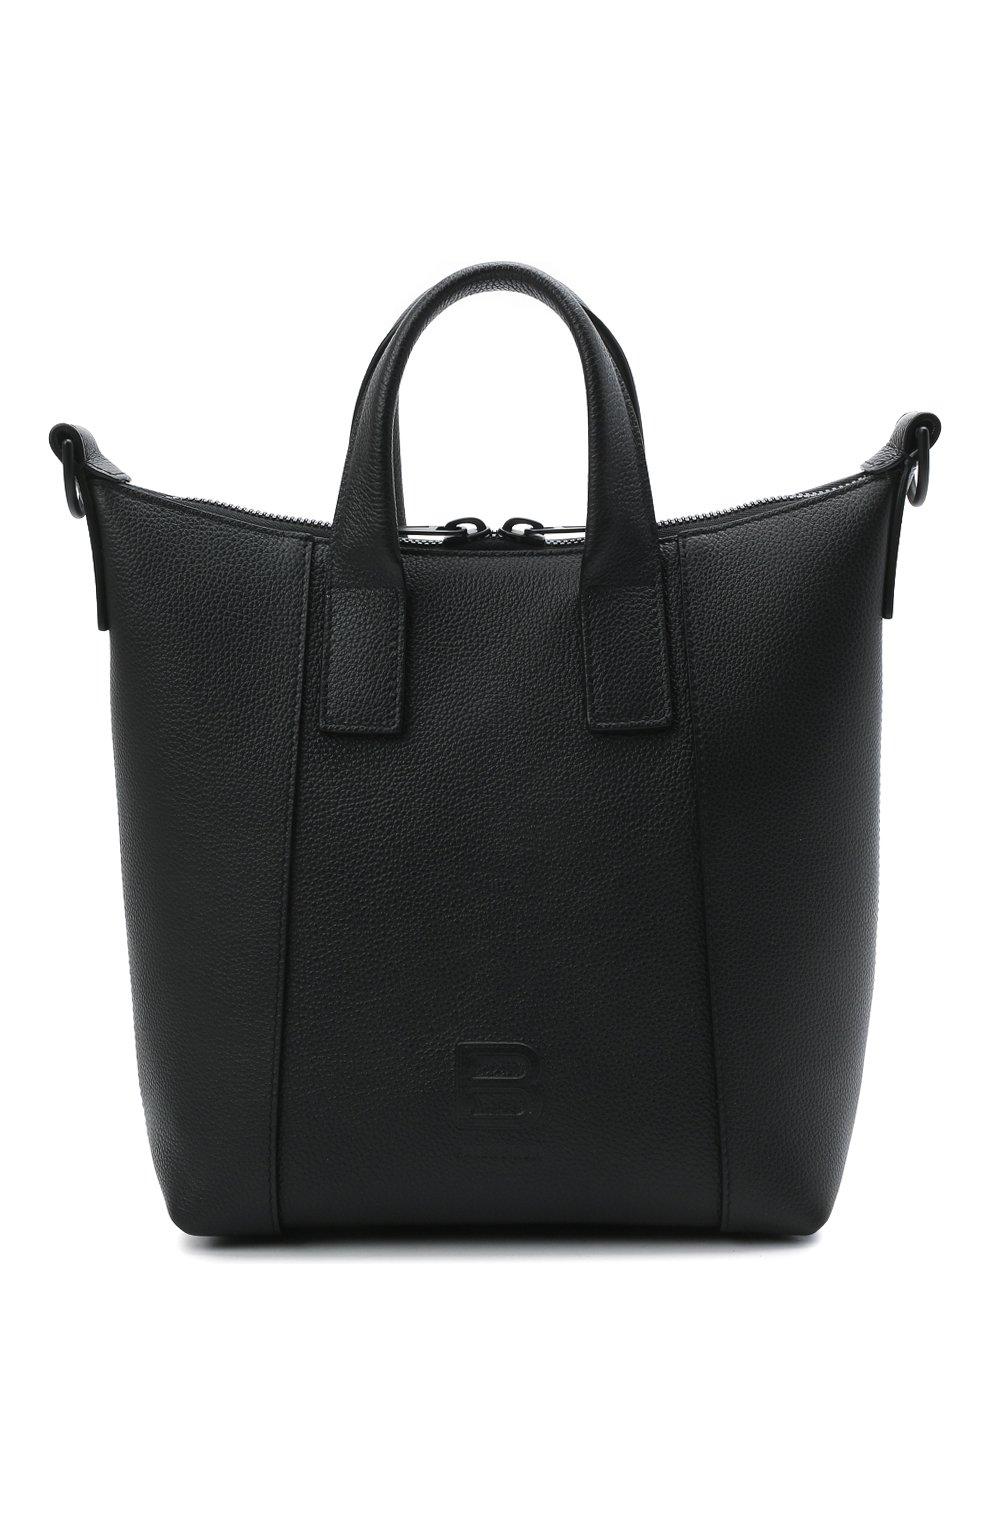 Мужская кожаная сумка-тоут hourglass BALENCIAGA черного цвета, арт. 644718/15Y37 | Фото 1